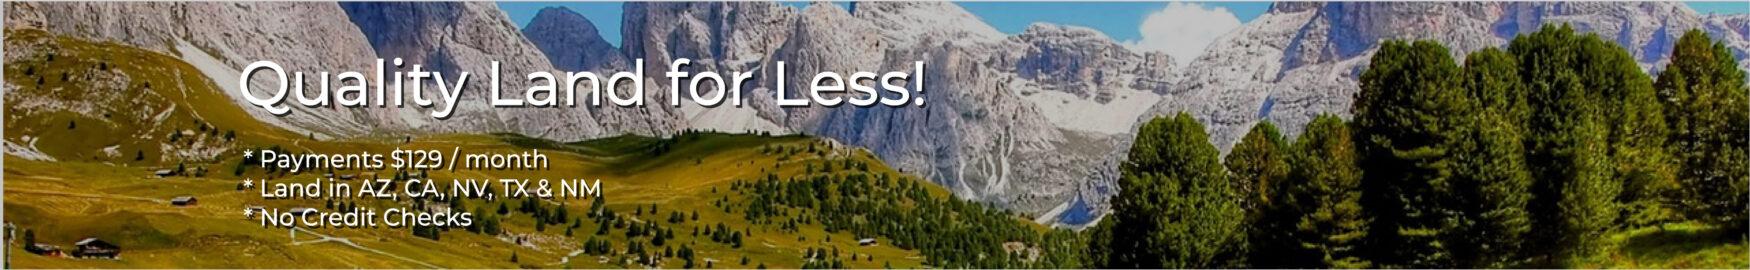 Land4less.us ad